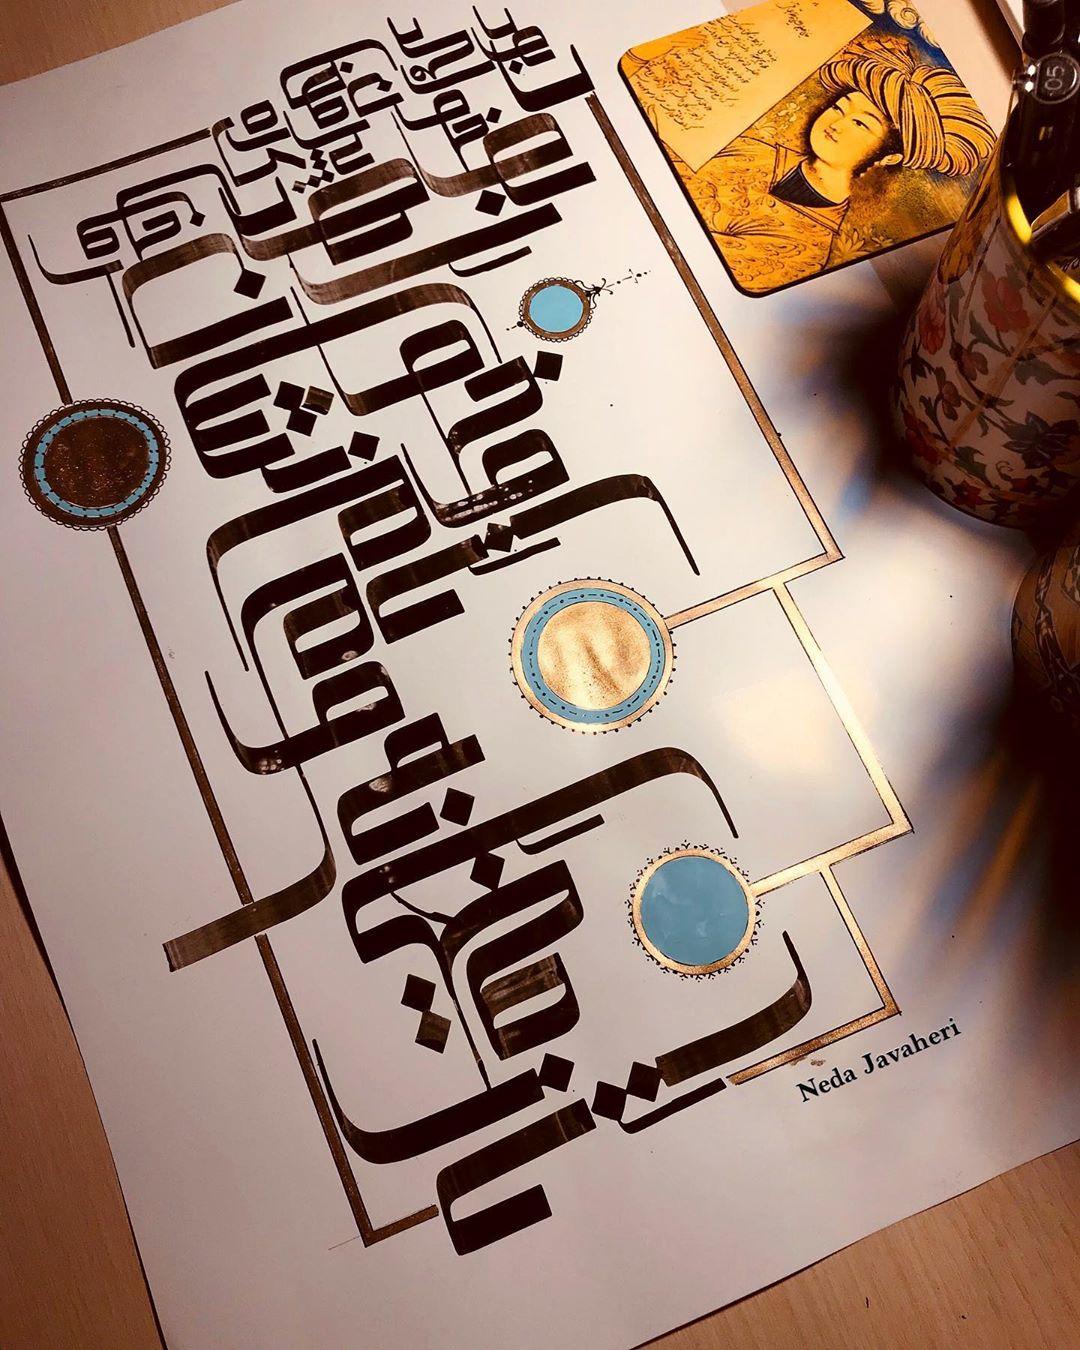 "Karya Kaligrafi  تا ز میخانه و می نام و نشان خواهد بود"" سر ما  خاکِ  ره  پیر مغان  خواهد بود "" ح…- Ne Javaher"